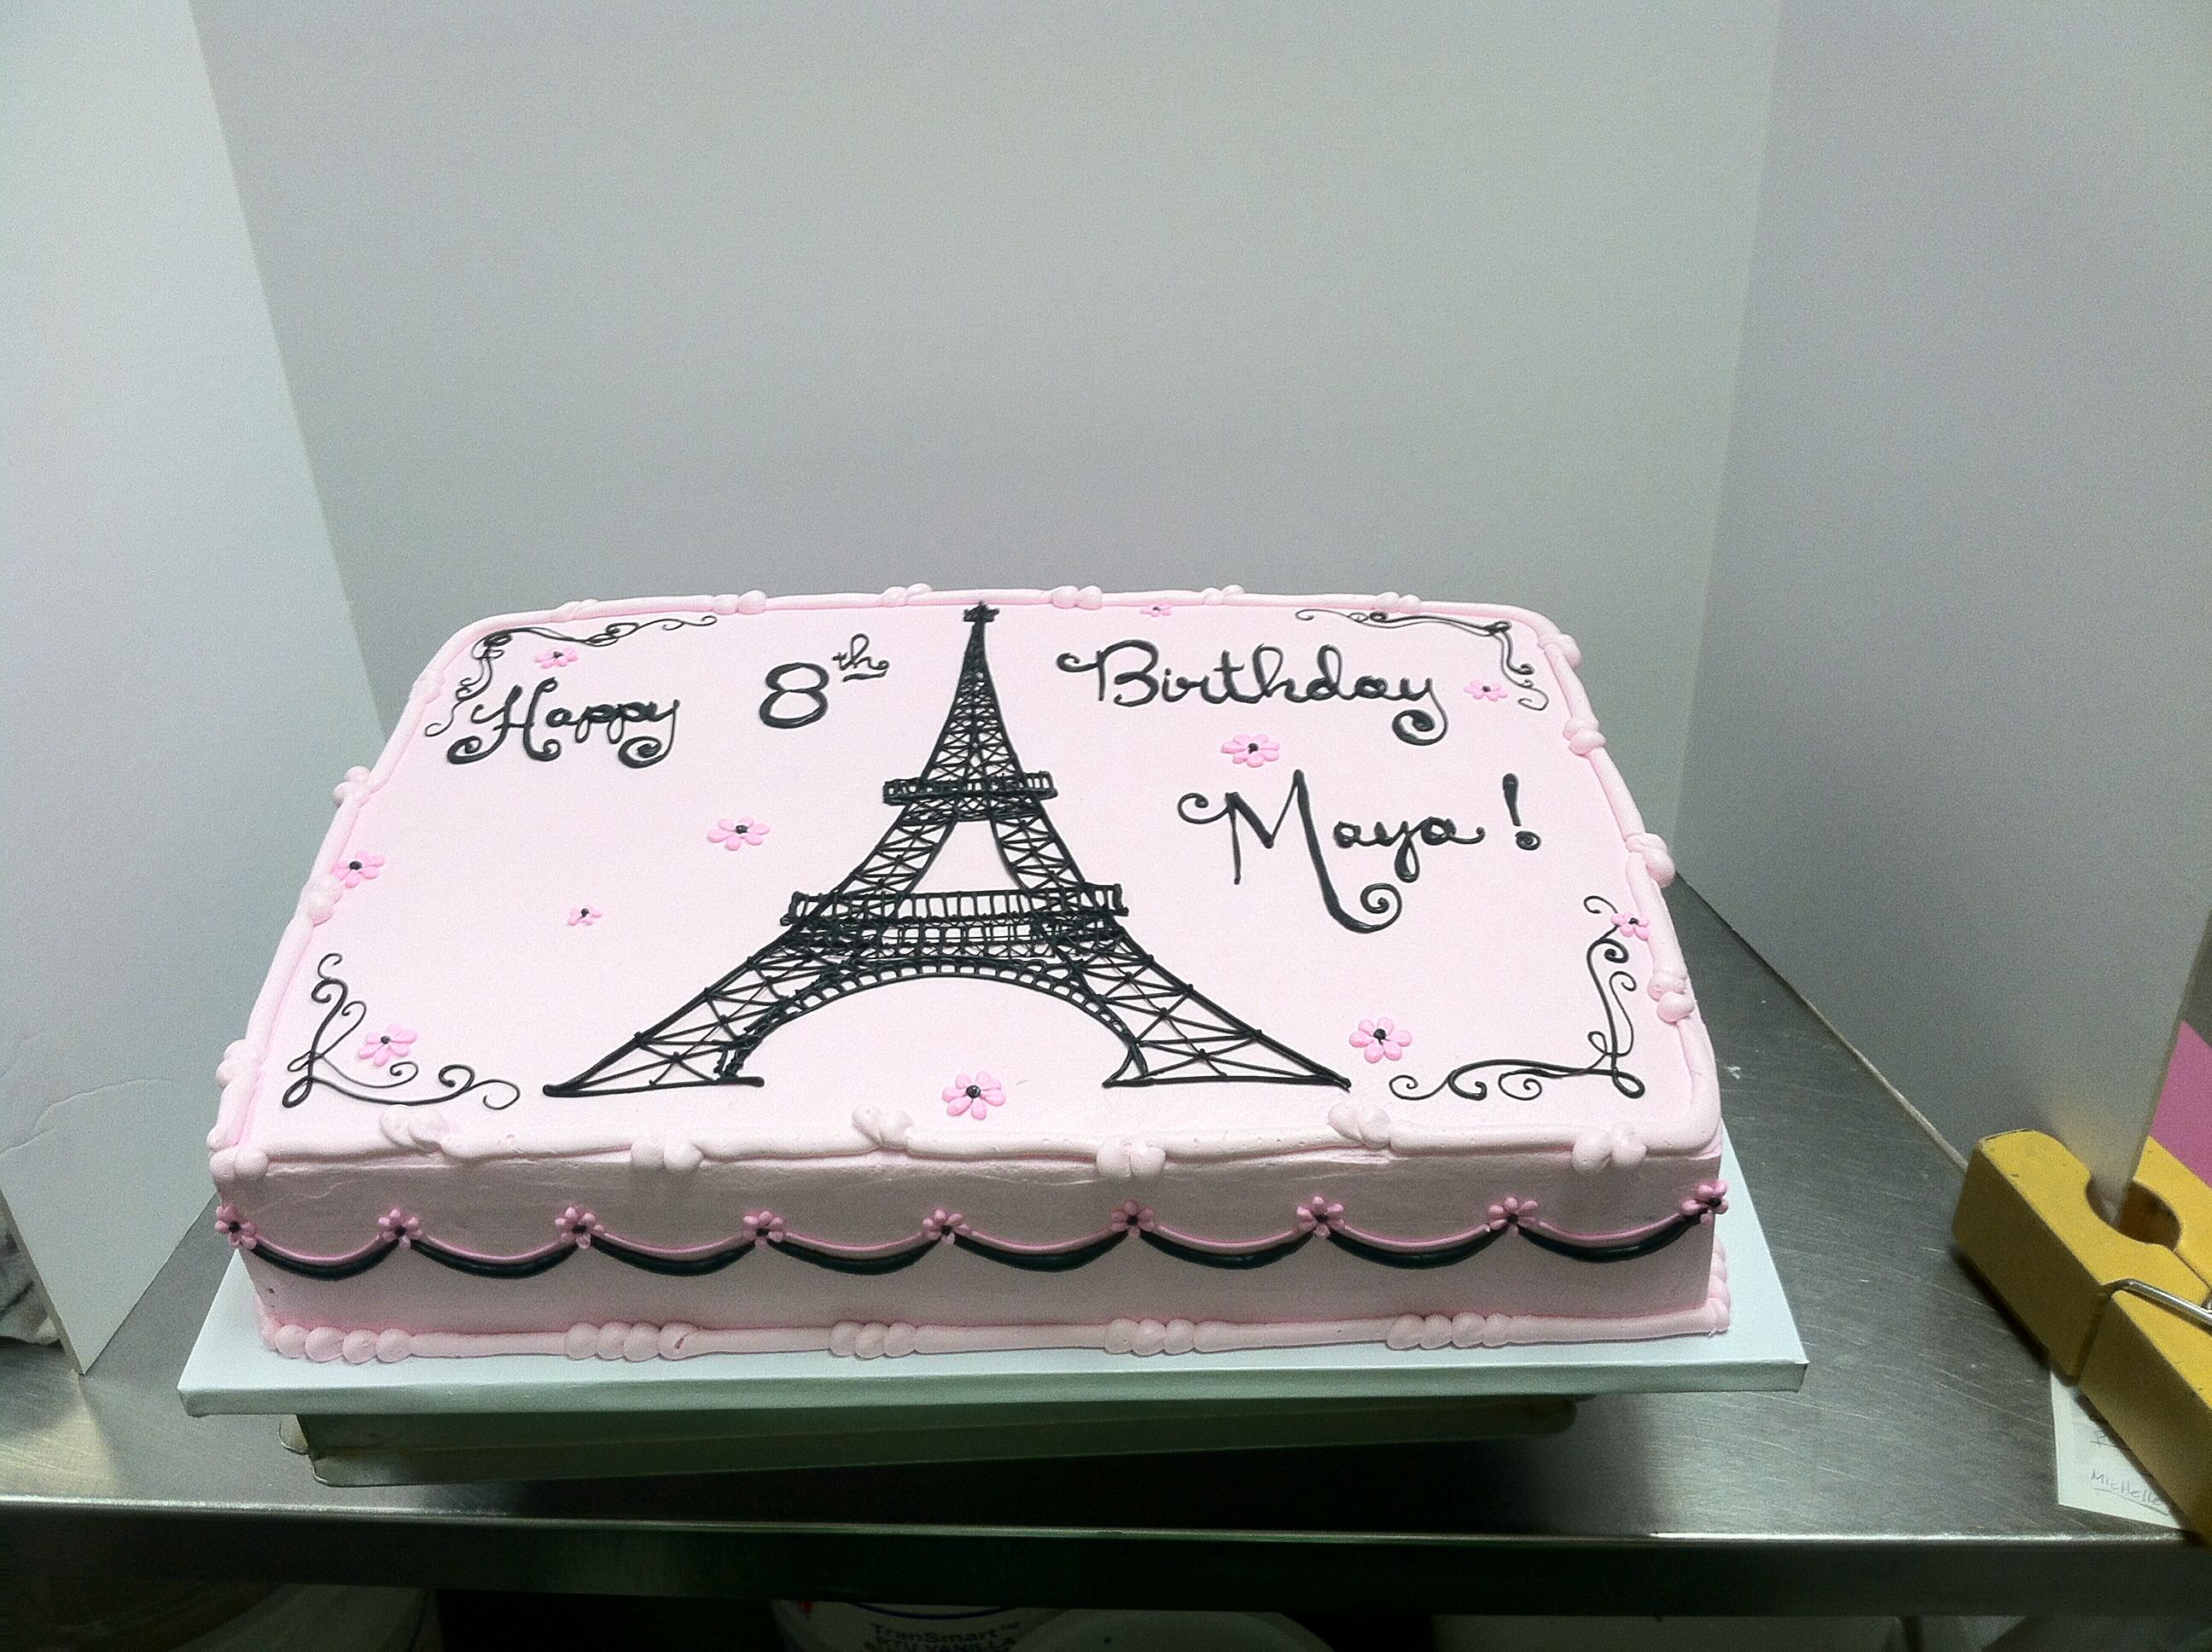 Wondrous Eiffel Tower Cake Lyckytreats Eiffeltower With Images Paris Personalised Birthday Cards Beptaeletsinfo